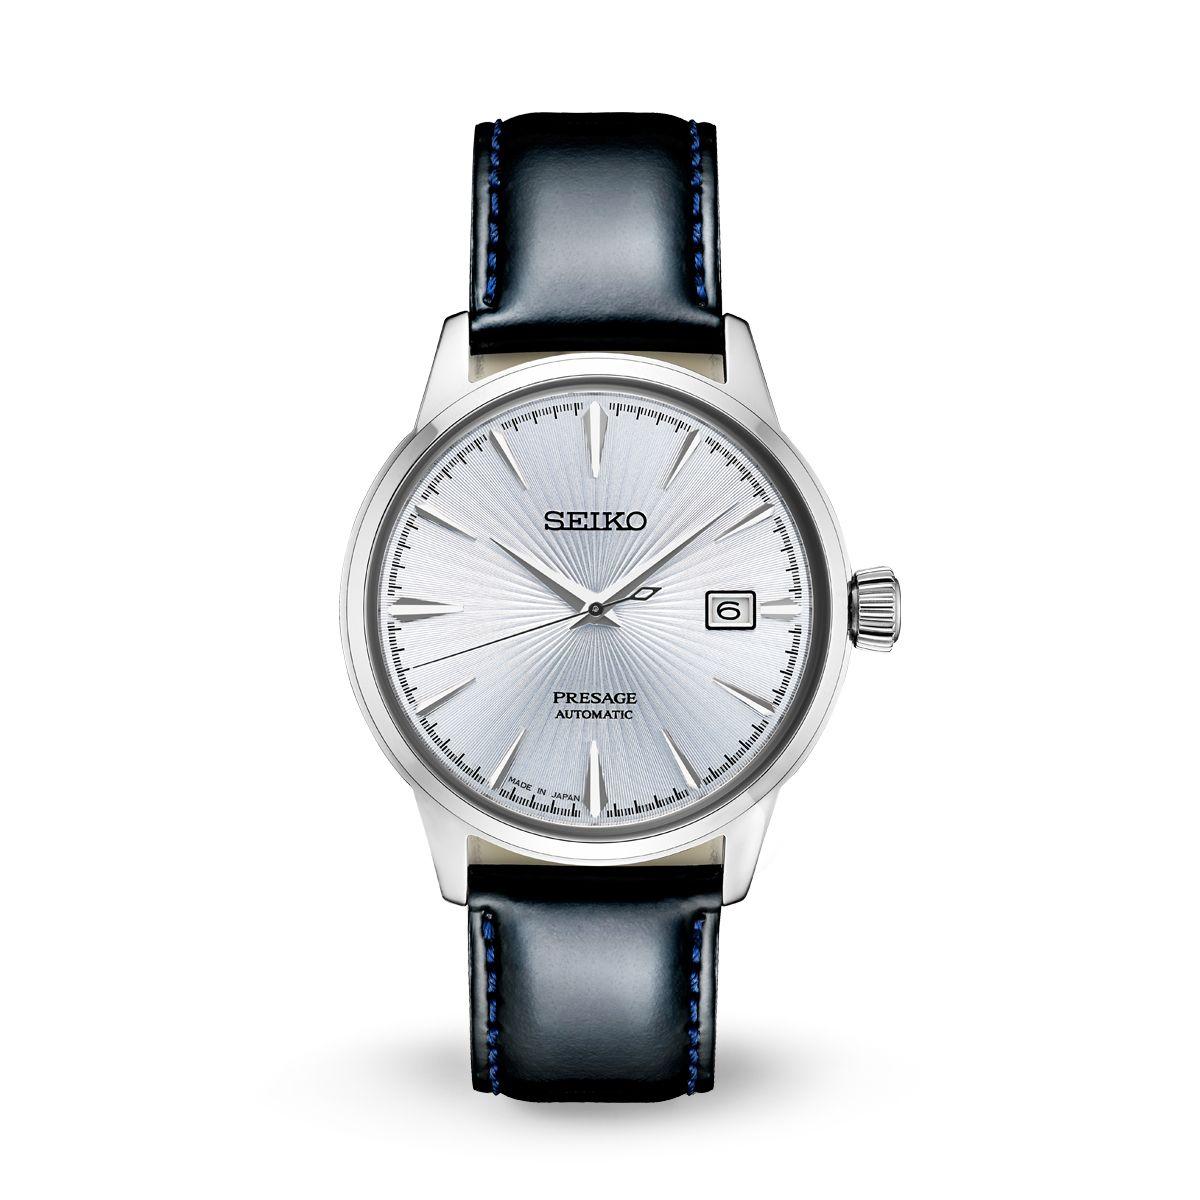 ef642c9aa3 Seiko Watches - Macy s